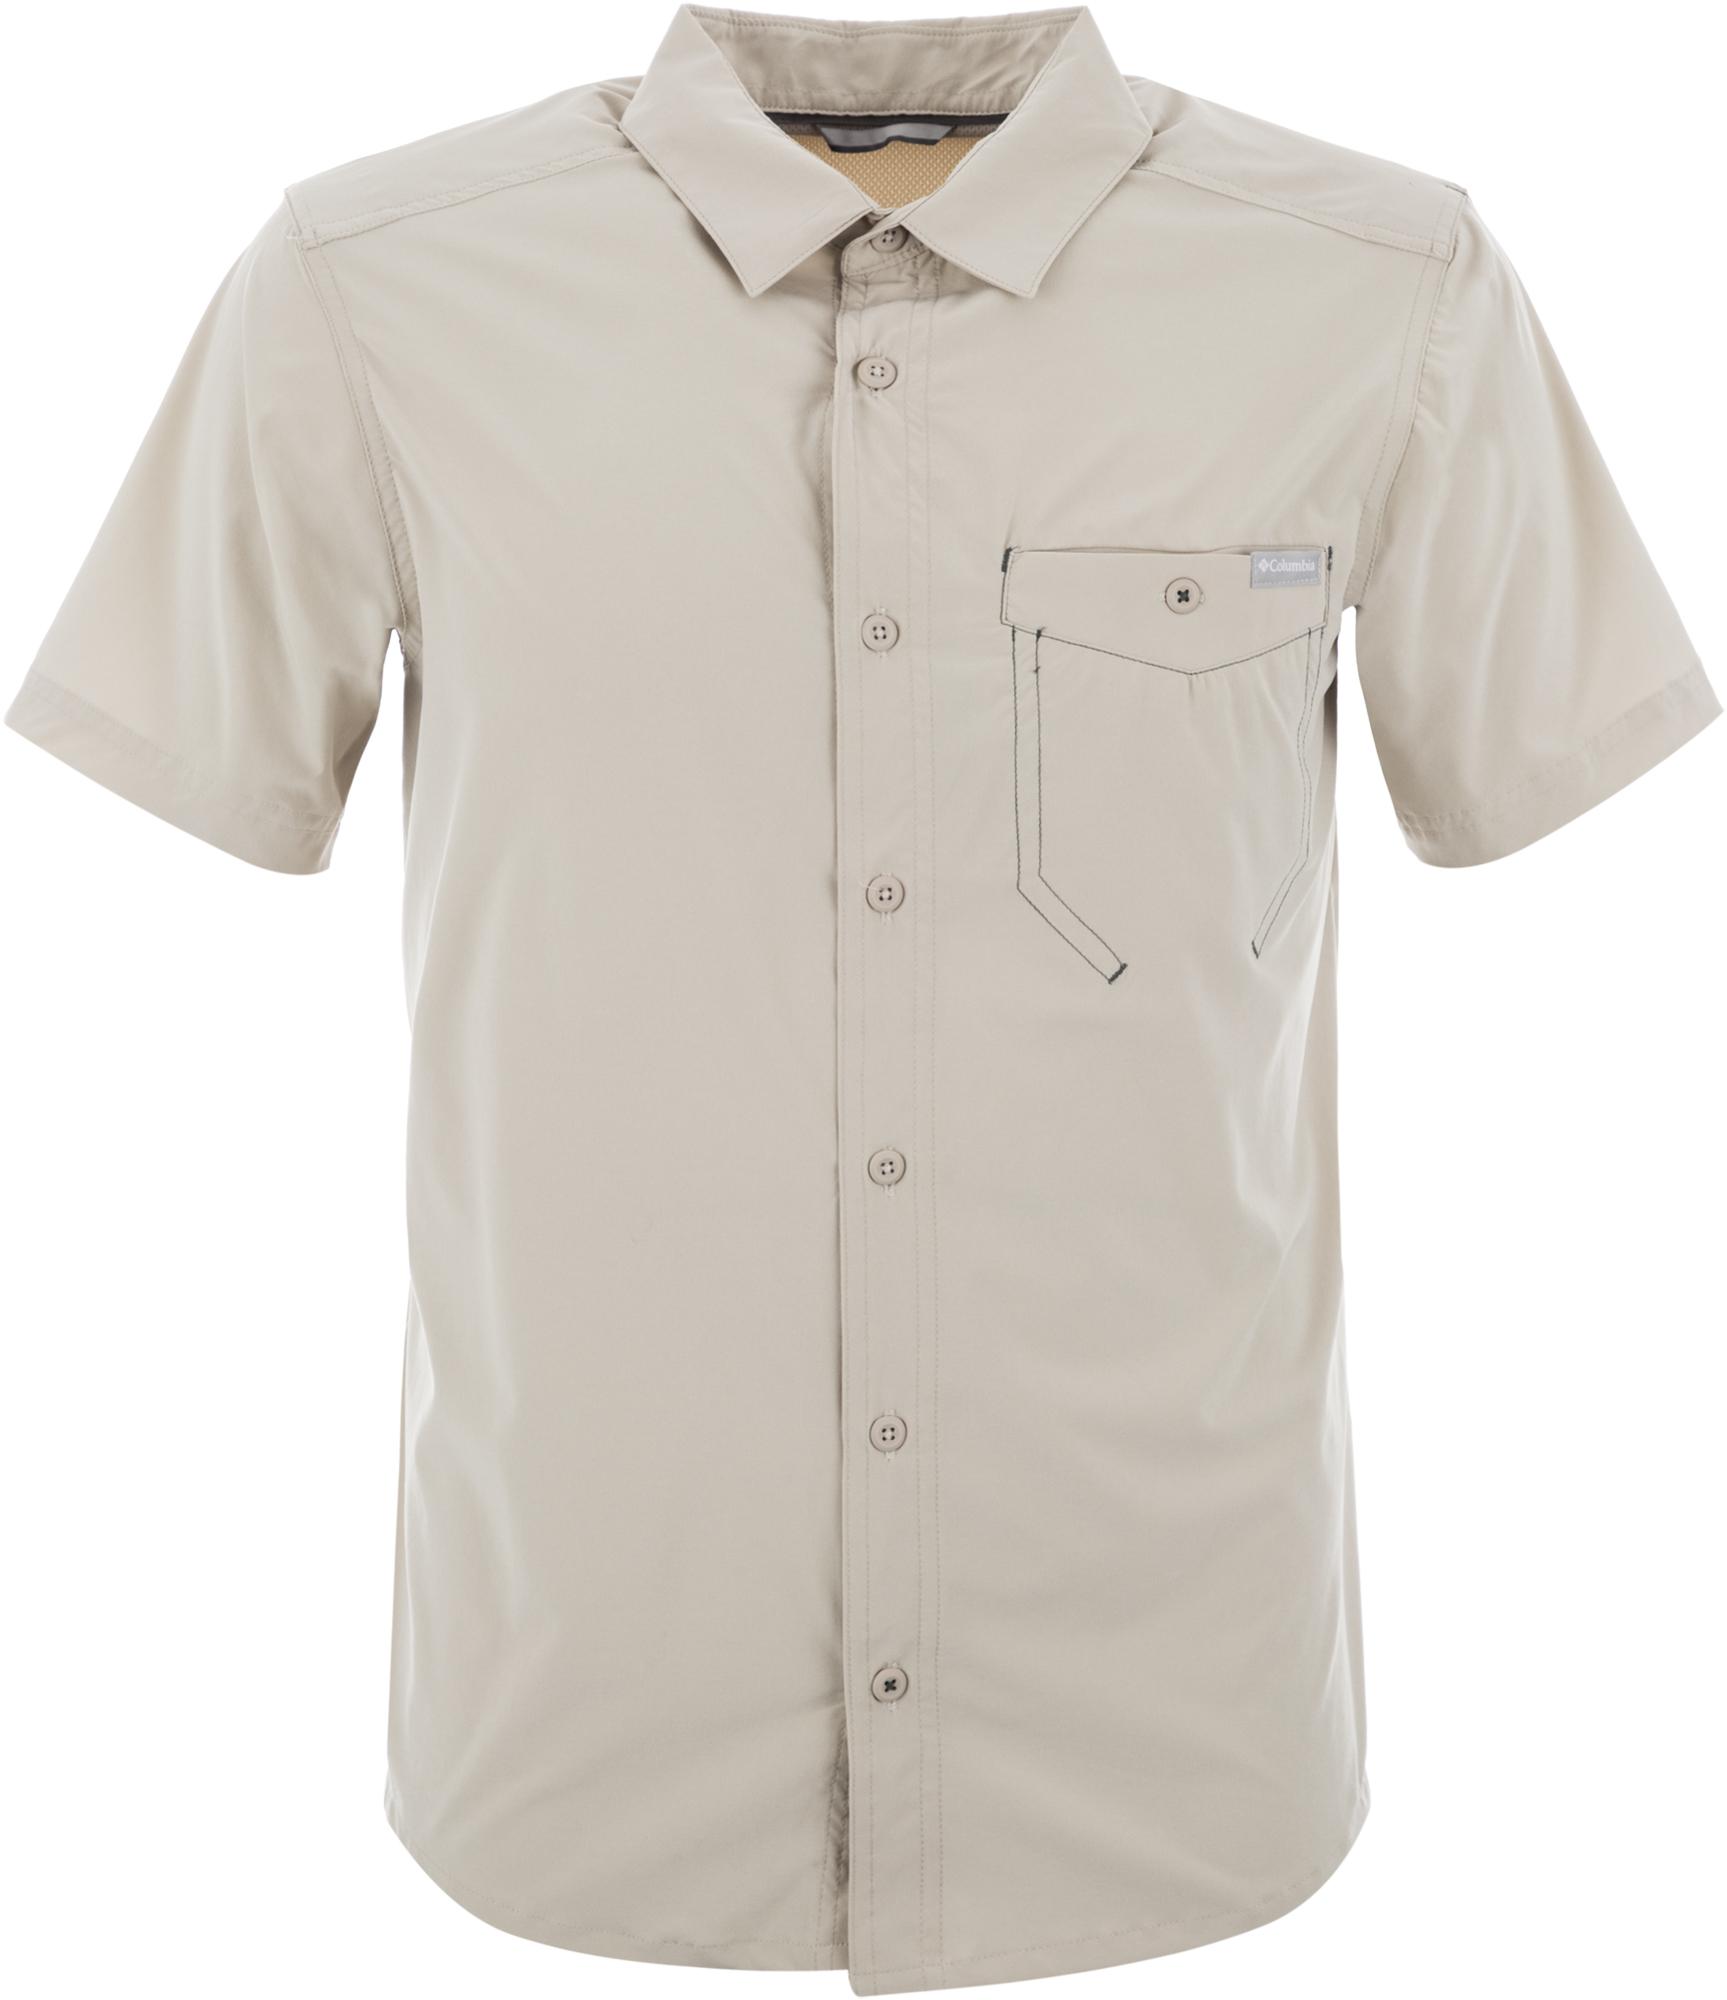 цена Columbia Рубашка мужская Columbia Triple Canyon Solid, размер 56-58 онлайн в 2017 году